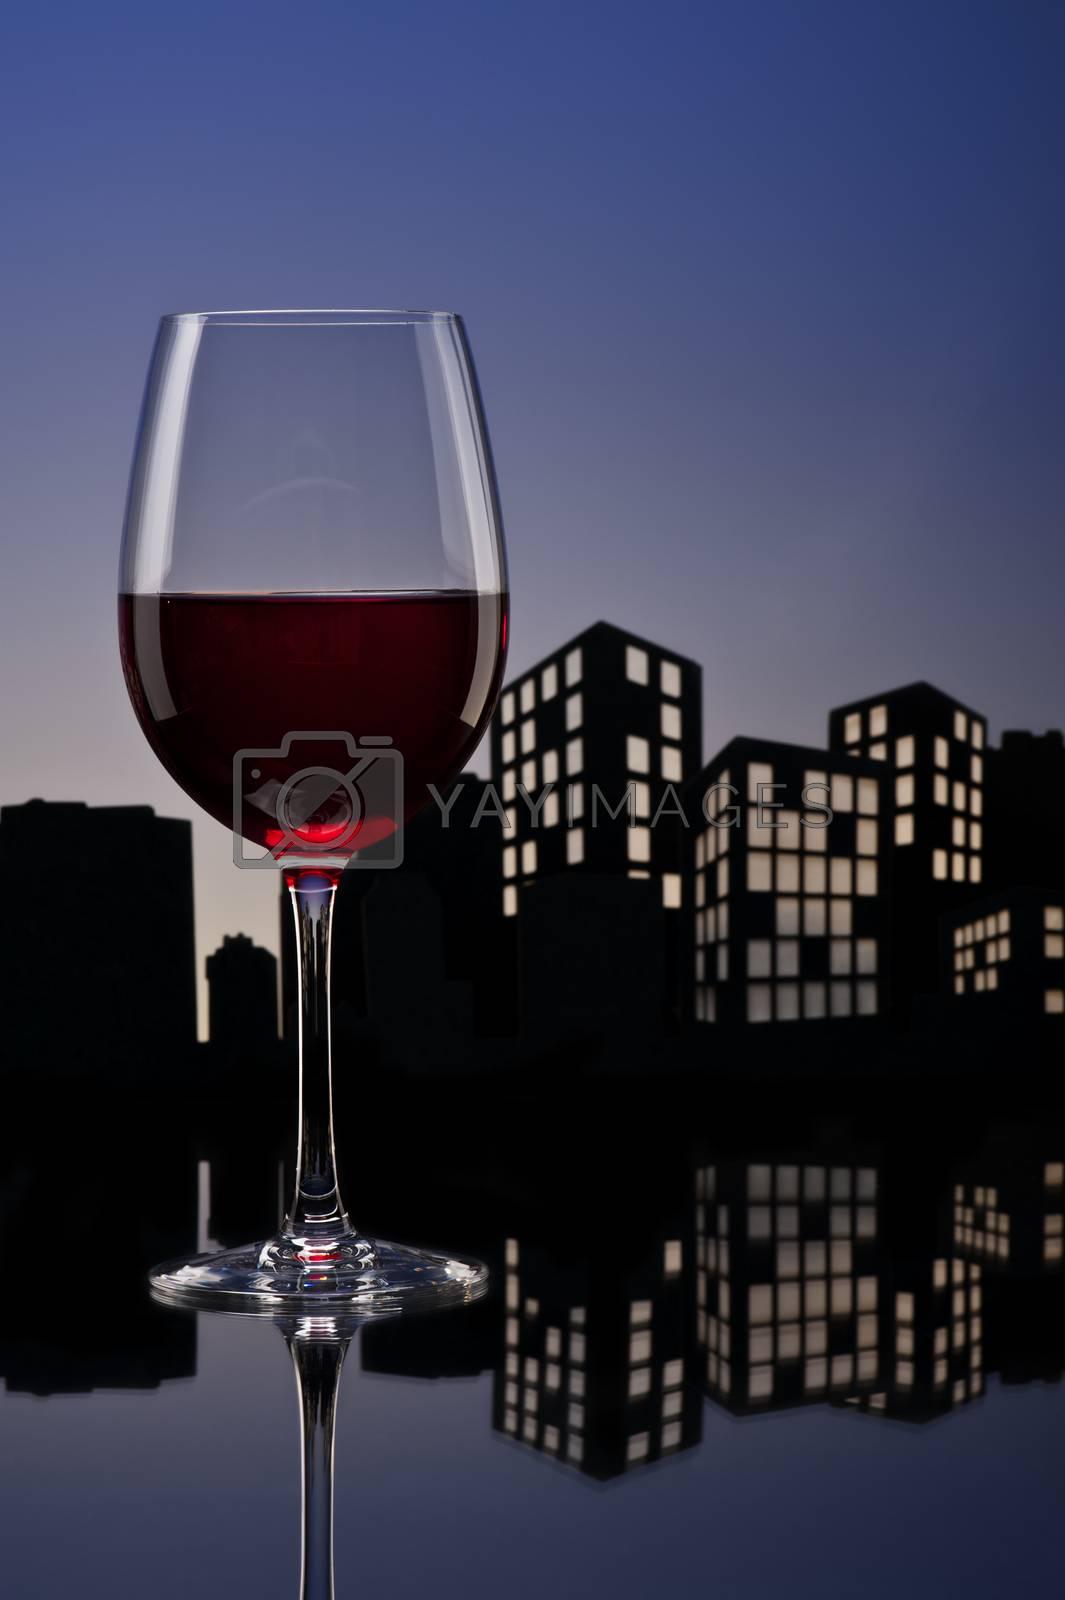 Metropolis Red Wine in city skyline setting